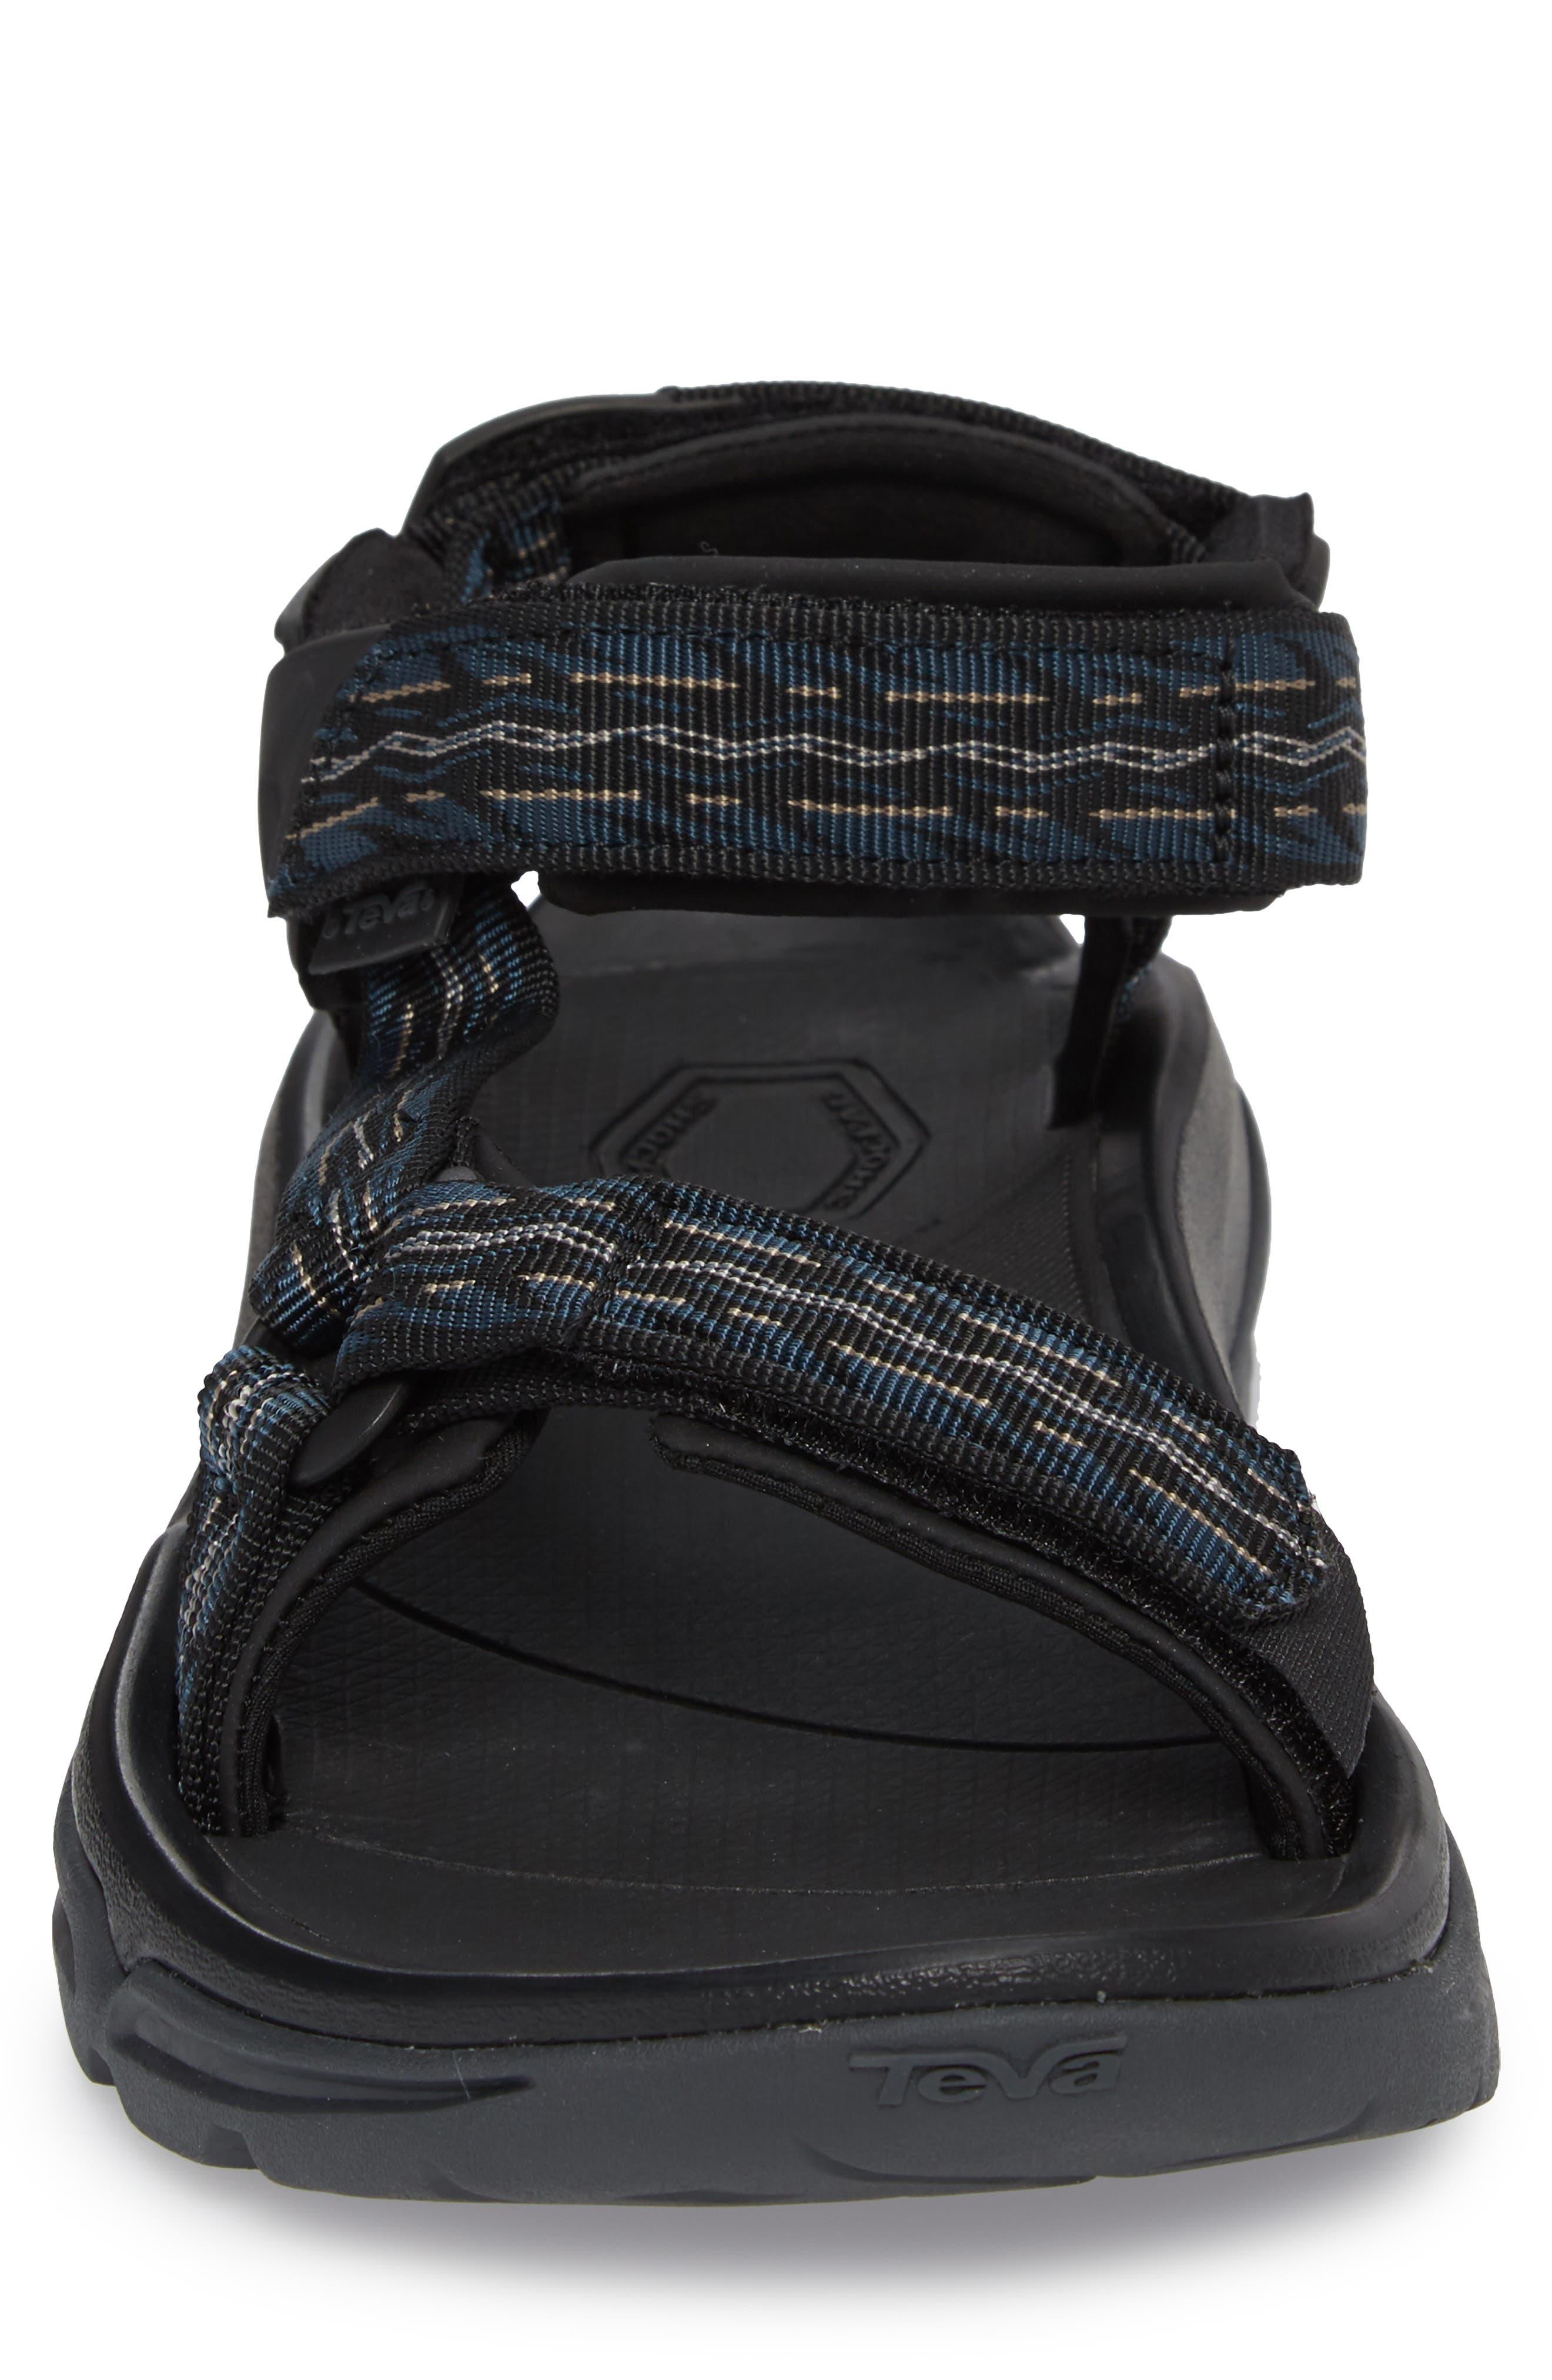 TEVA, Terra Fi 4 Sport Sandal, Alternate thumbnail 4, color, MIDNIGHT BLUE NYLON